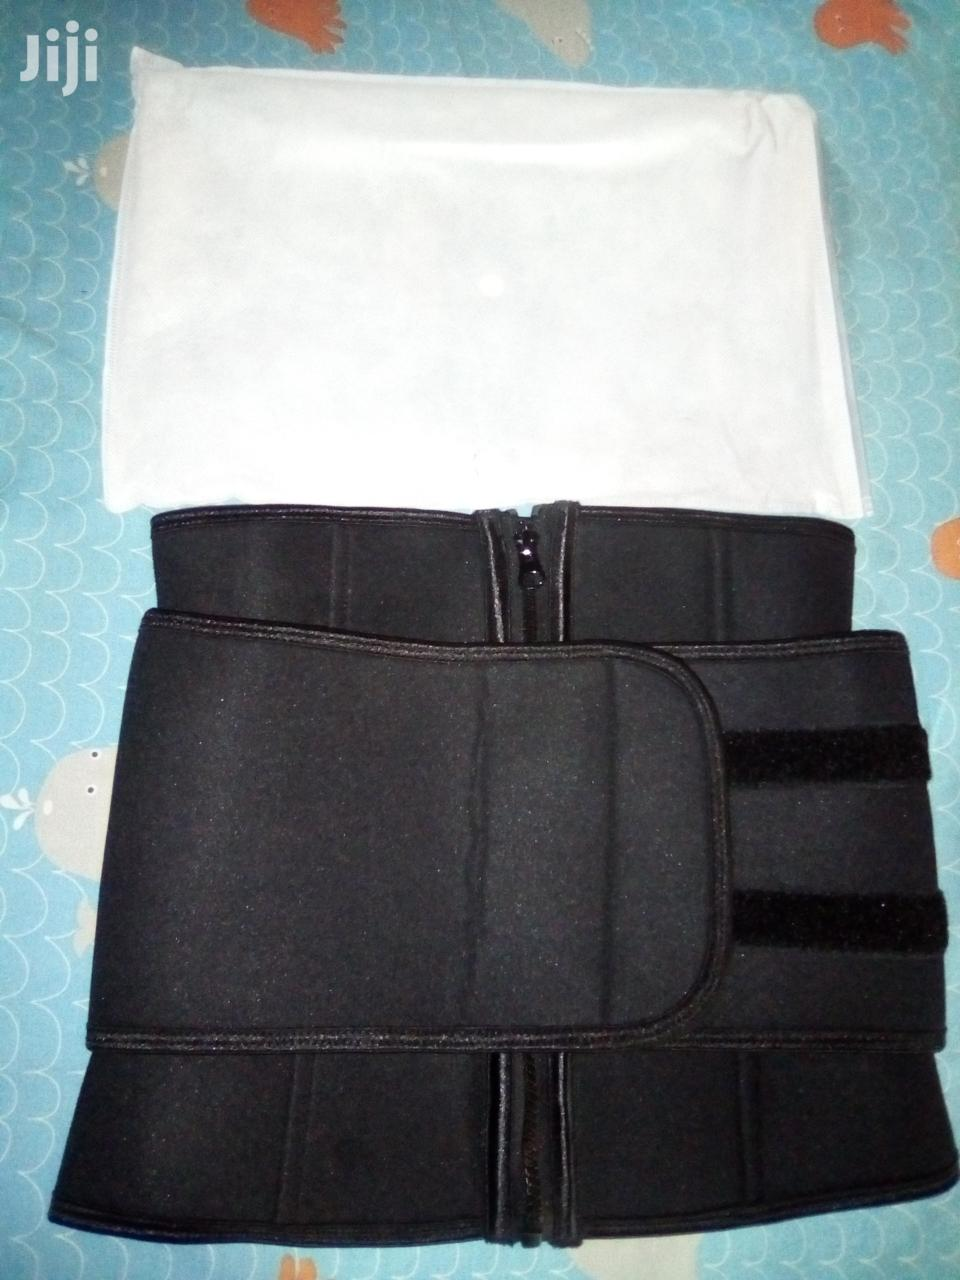 Single Strap/Plaster Compression Belt Corset Waist Trainer | Clothing Accessories for sale in Lekki, Lagos State, Nigeria